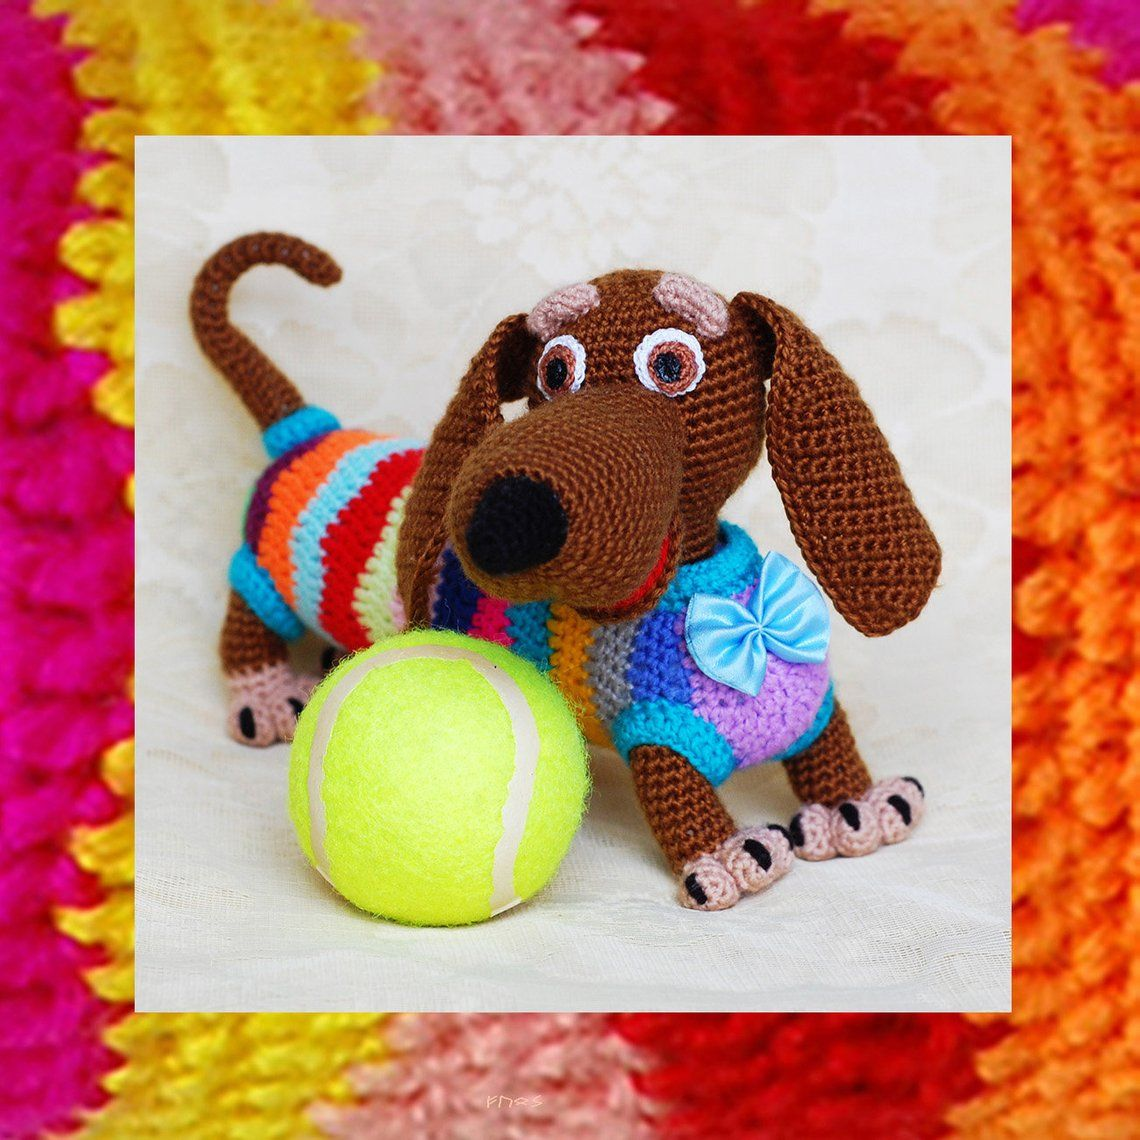 030 Amigurumi dog pattern. Crochet tabby lady dachshund tutorial. Colorful crochet toy. Instant download: ENGLISH, FRENCH, DUTCH